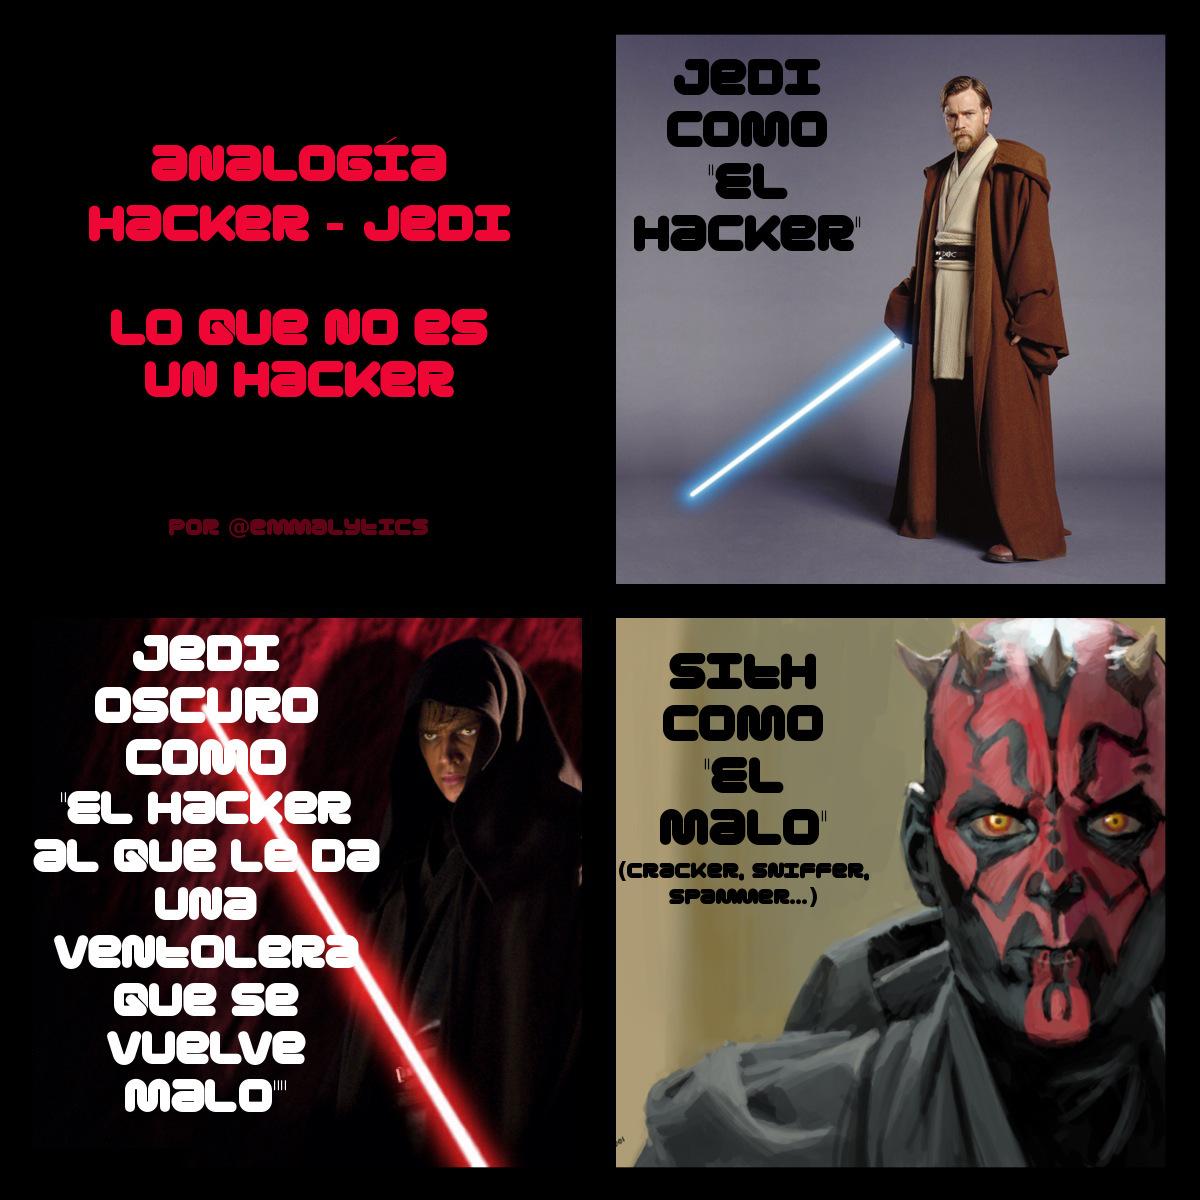 Analogía Hacker - Jedi